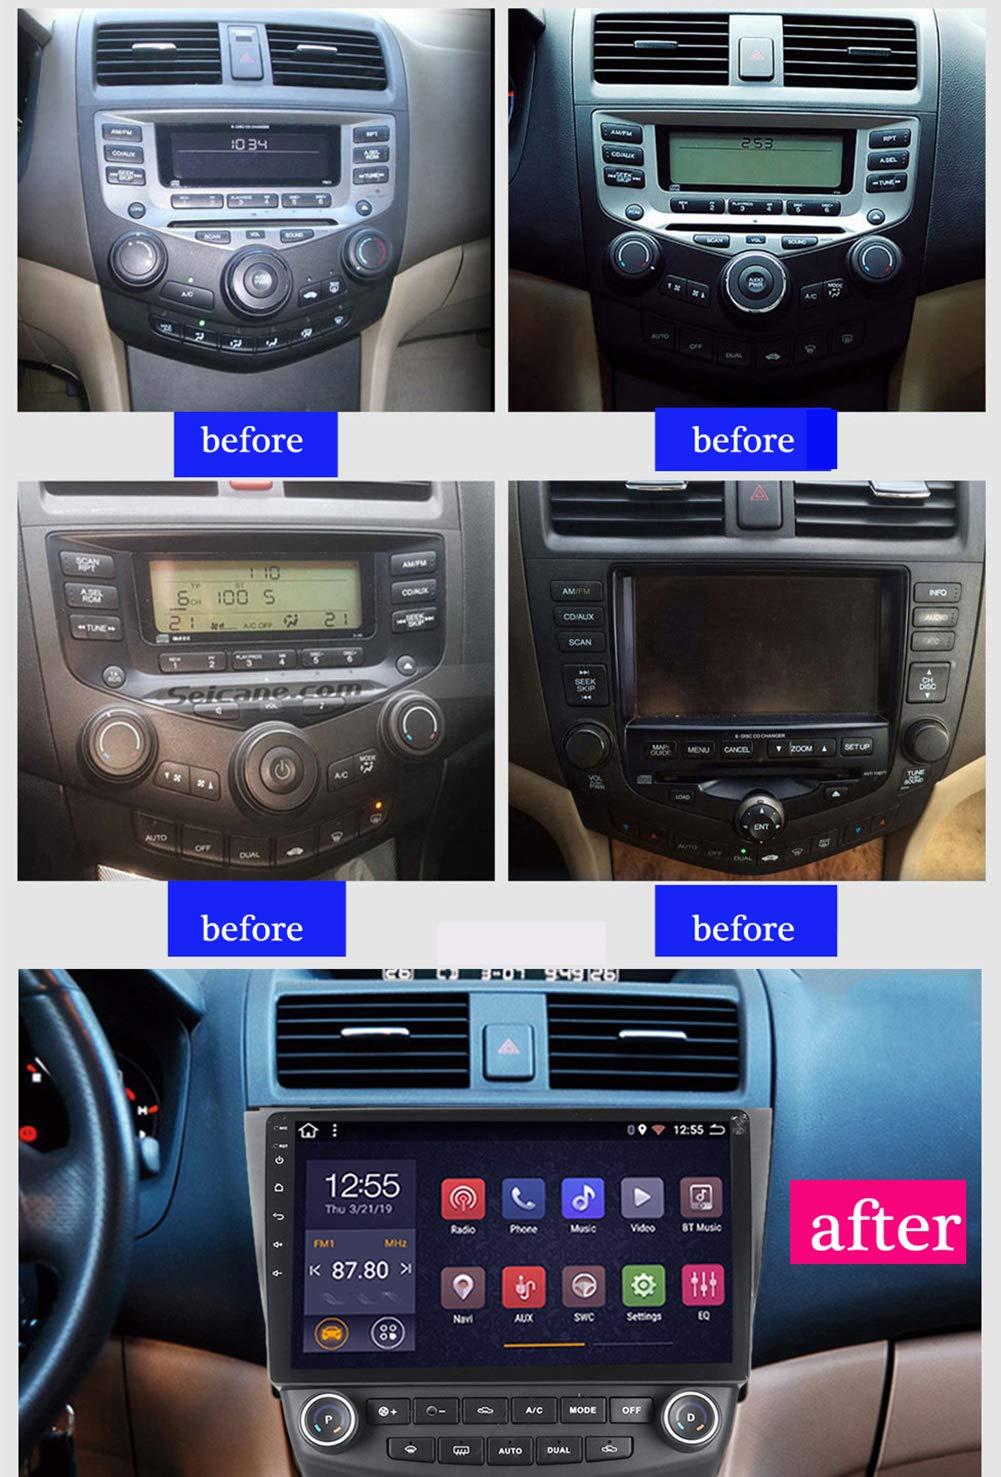 HARBERIDE-Android-81-Auto-Multimedia-Player-GPS-Navigation-fr-Honda-Accord-7-2003-2007-mit-Ultradnne-1080P-9-Zoll-UKW-Radio-WiFi-Bluetooth-Freisprechfunktion-Dual-USB-Lenkradsteuerung